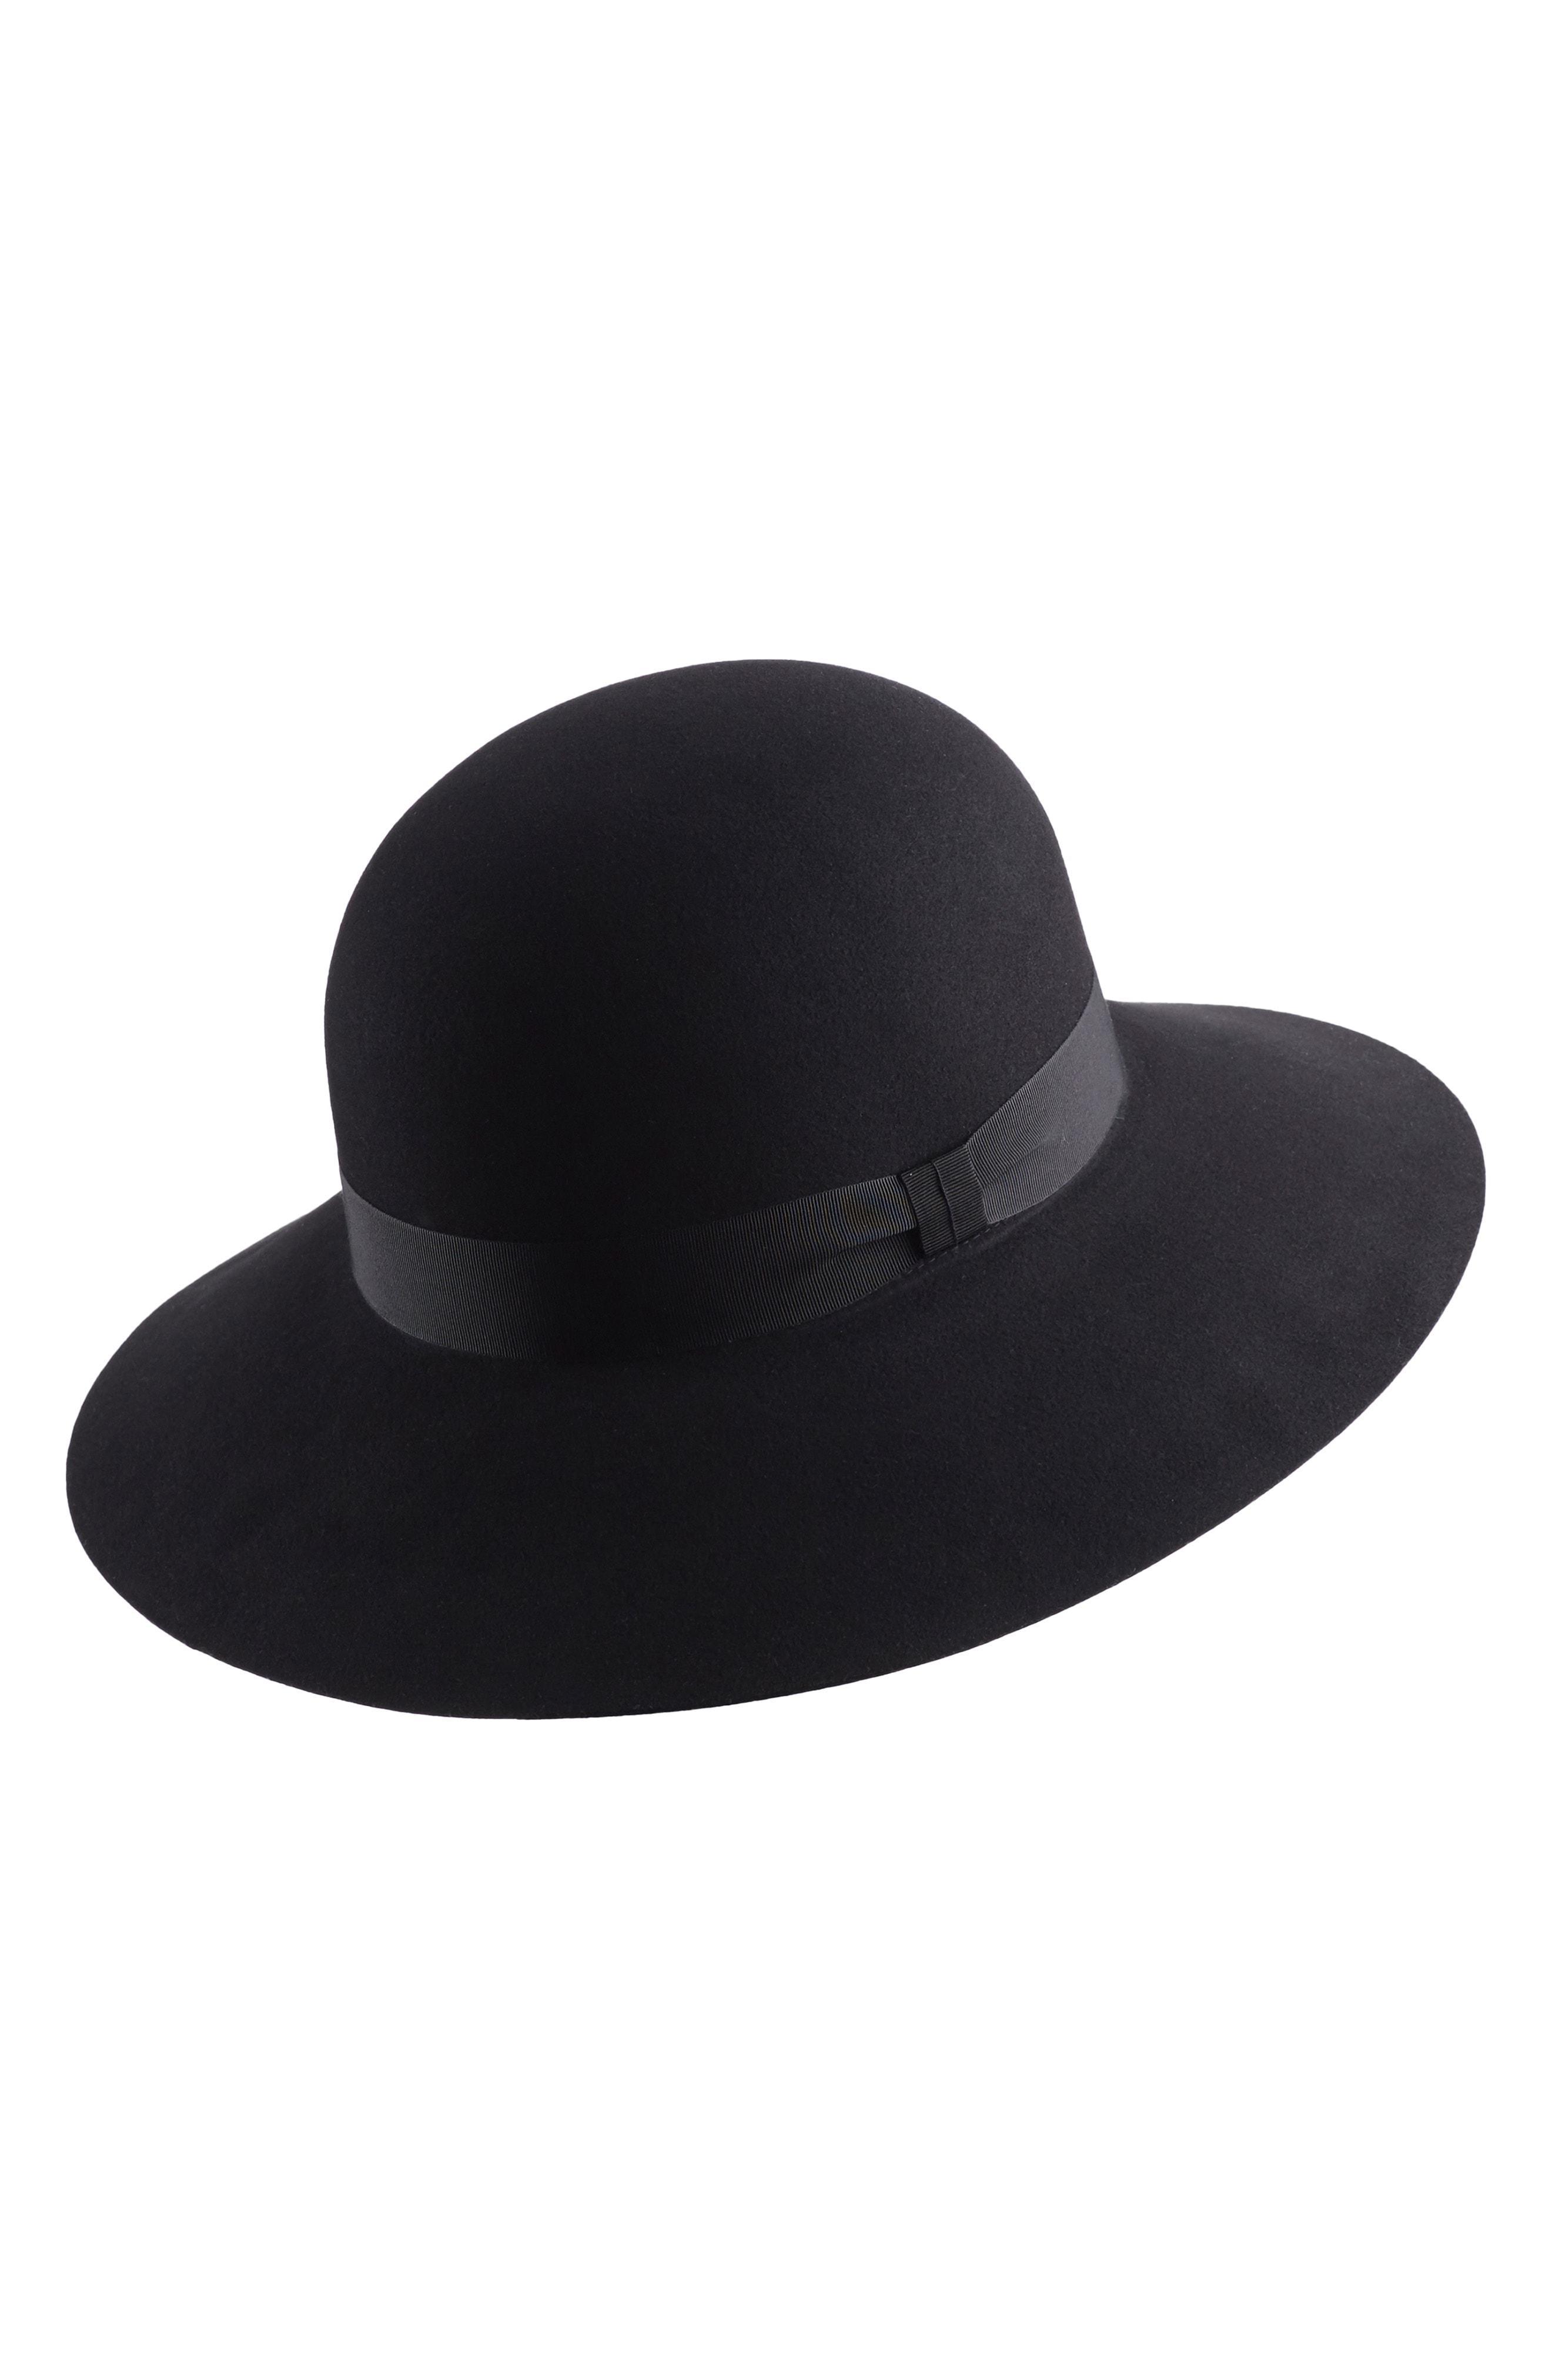 7d4e3bc5ad5 Lyst - Helen Kaminski Wool Hat in Black